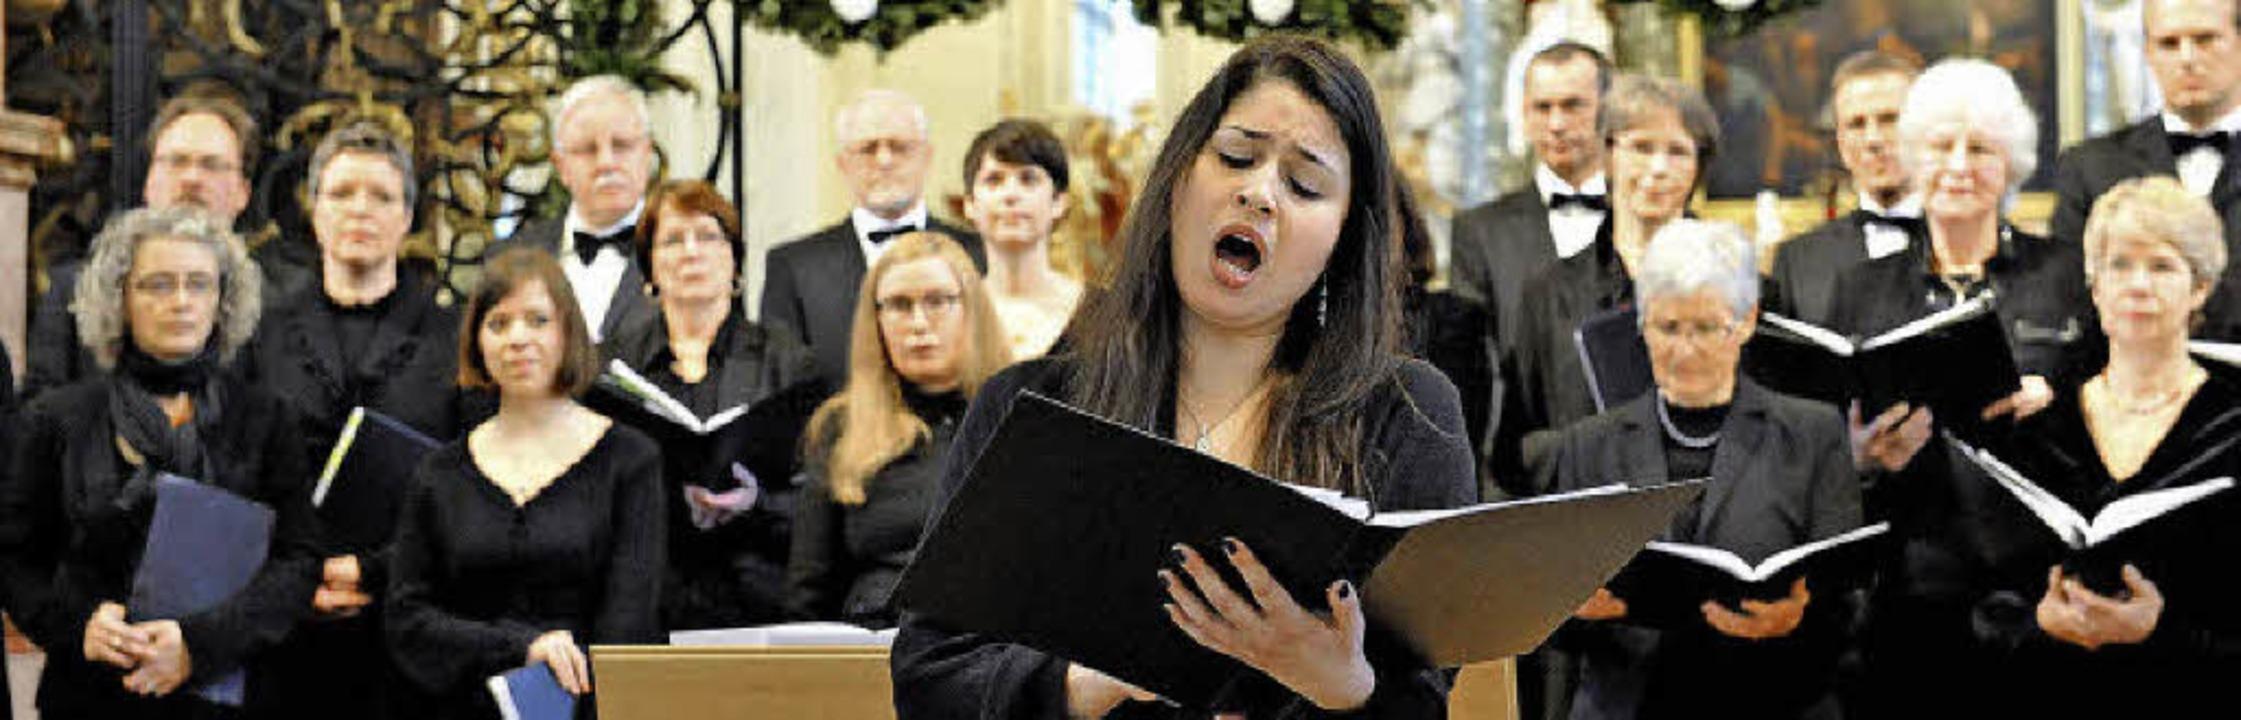 Sopranistin Lisa López sang beim Konze...namerikanischer Barockmusik die Soli.     Foto: Franziska Löffler